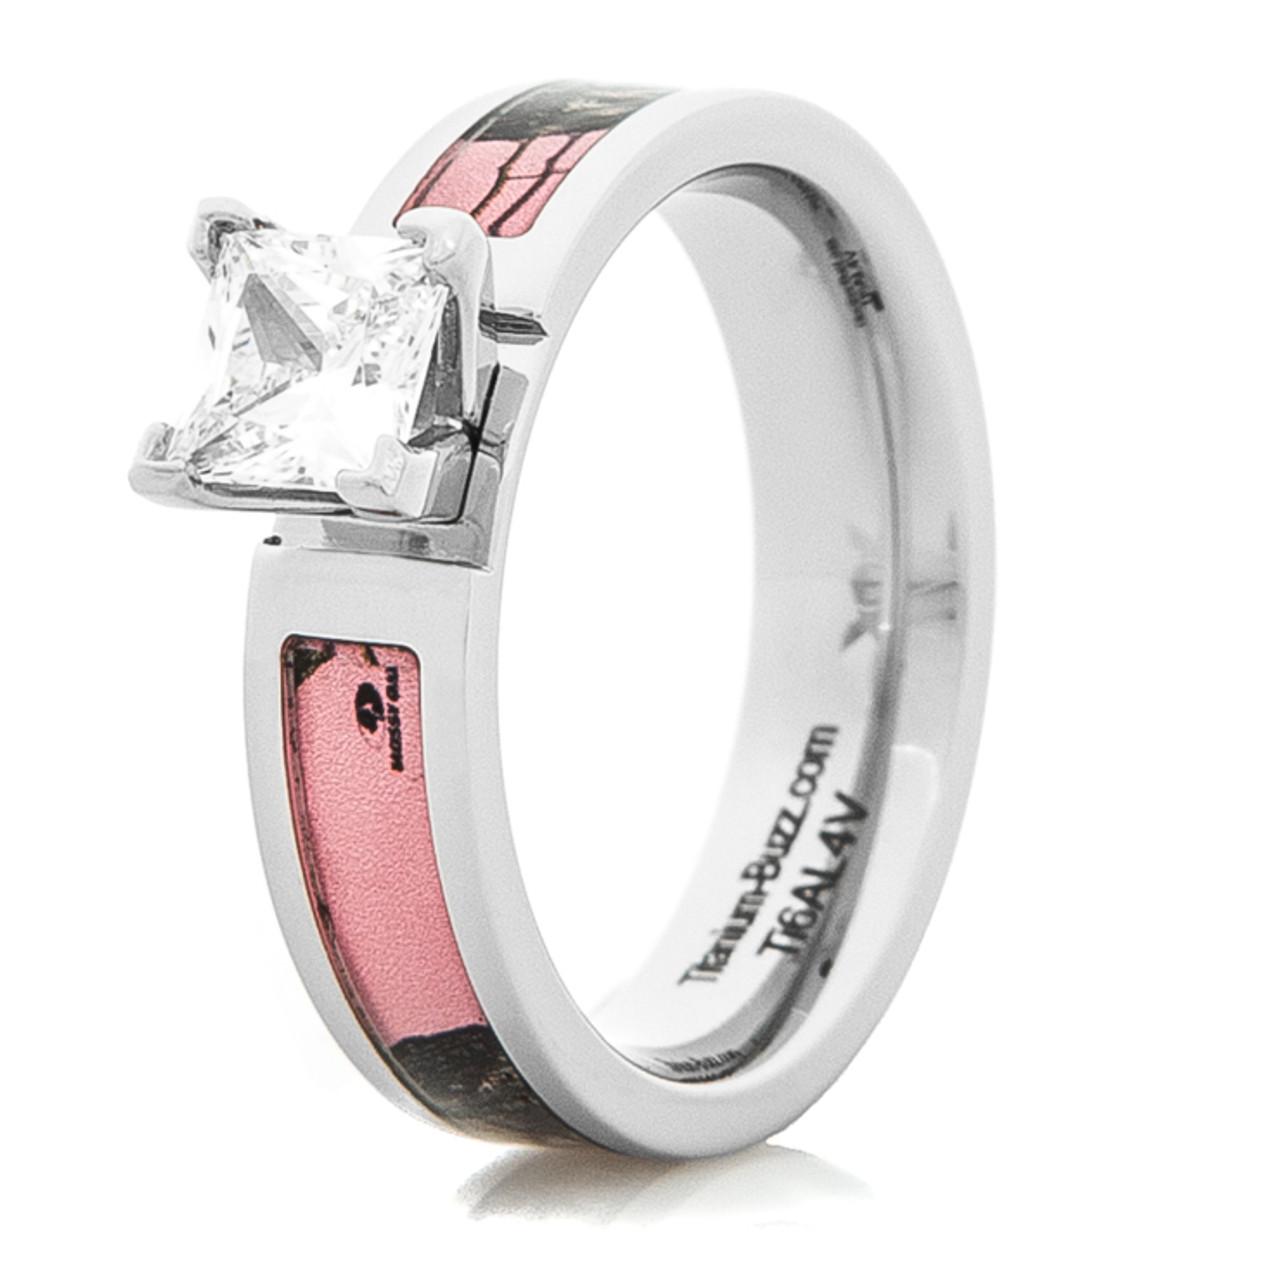 Cobalt Chrome Pink Mossy Oak Diamond Ring TitaniumBuzz